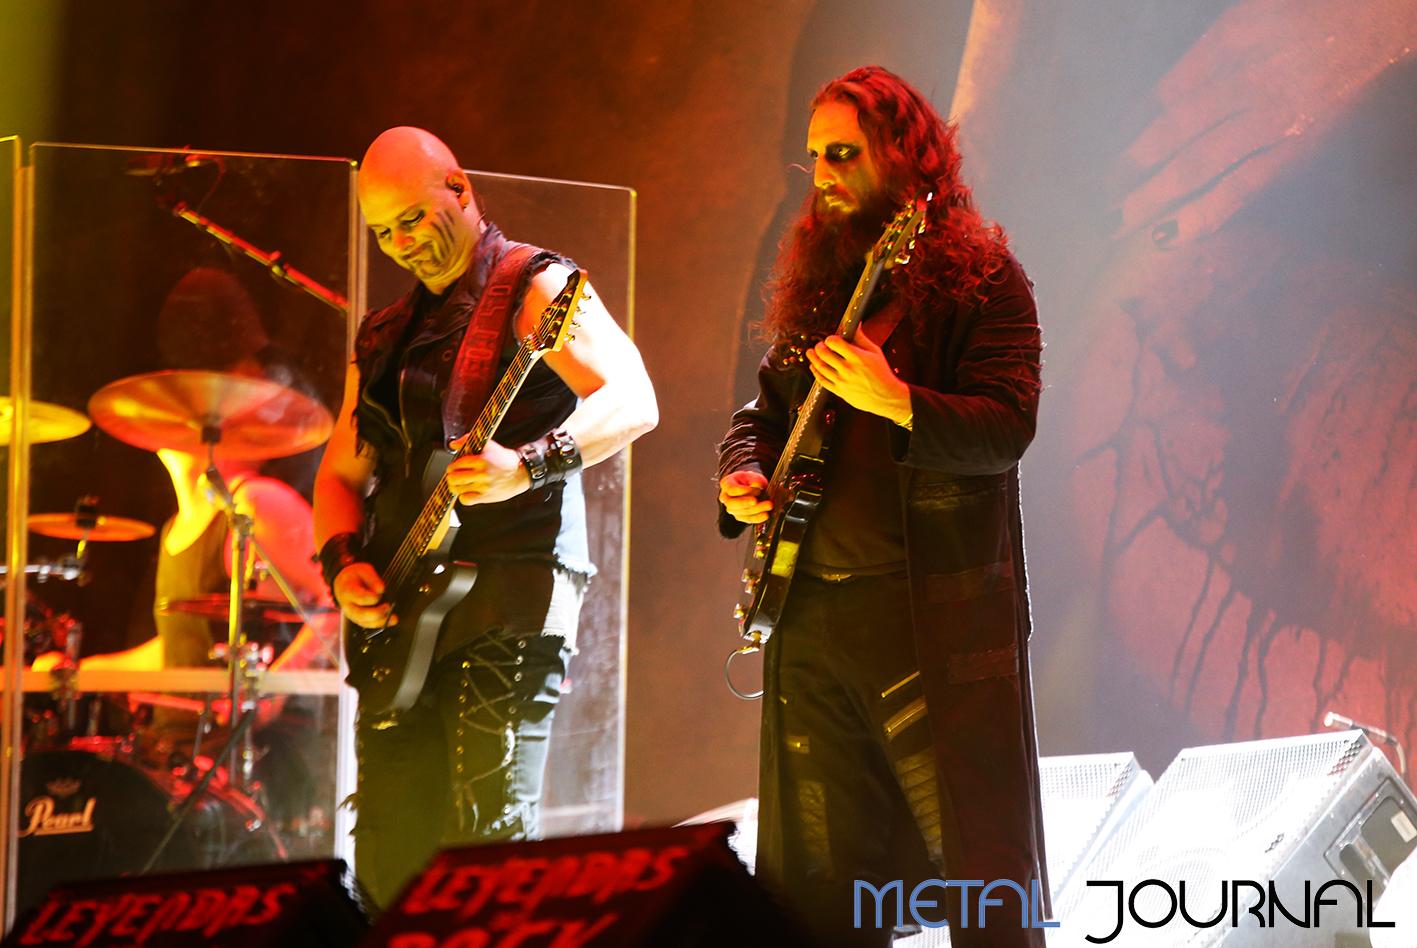 cradle of filth - leyendas del rock 2019 metal journal pic 2